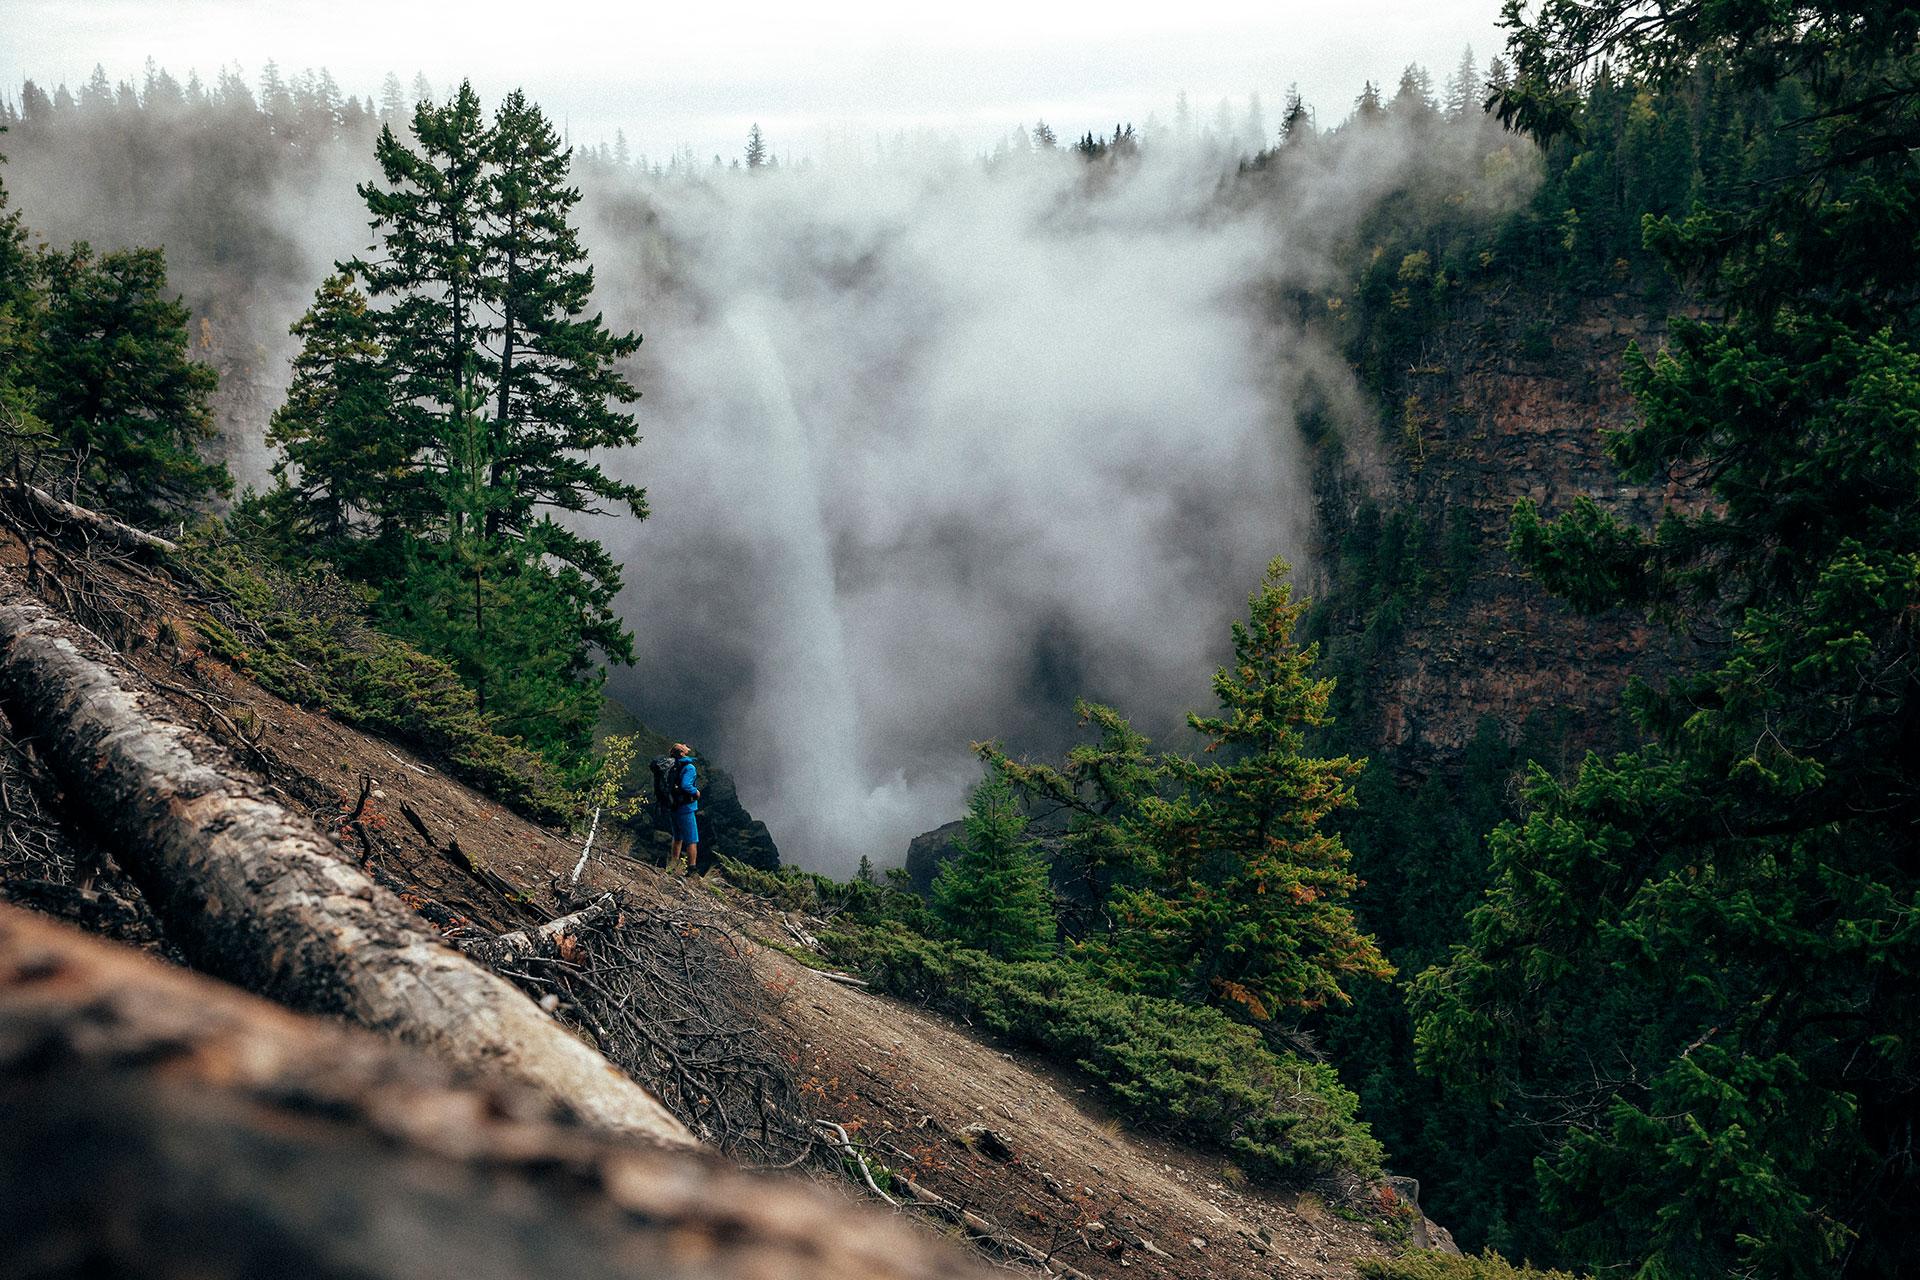 fotografie outdoor wandern trekking rocky mountains kanada deutschland stuttgart